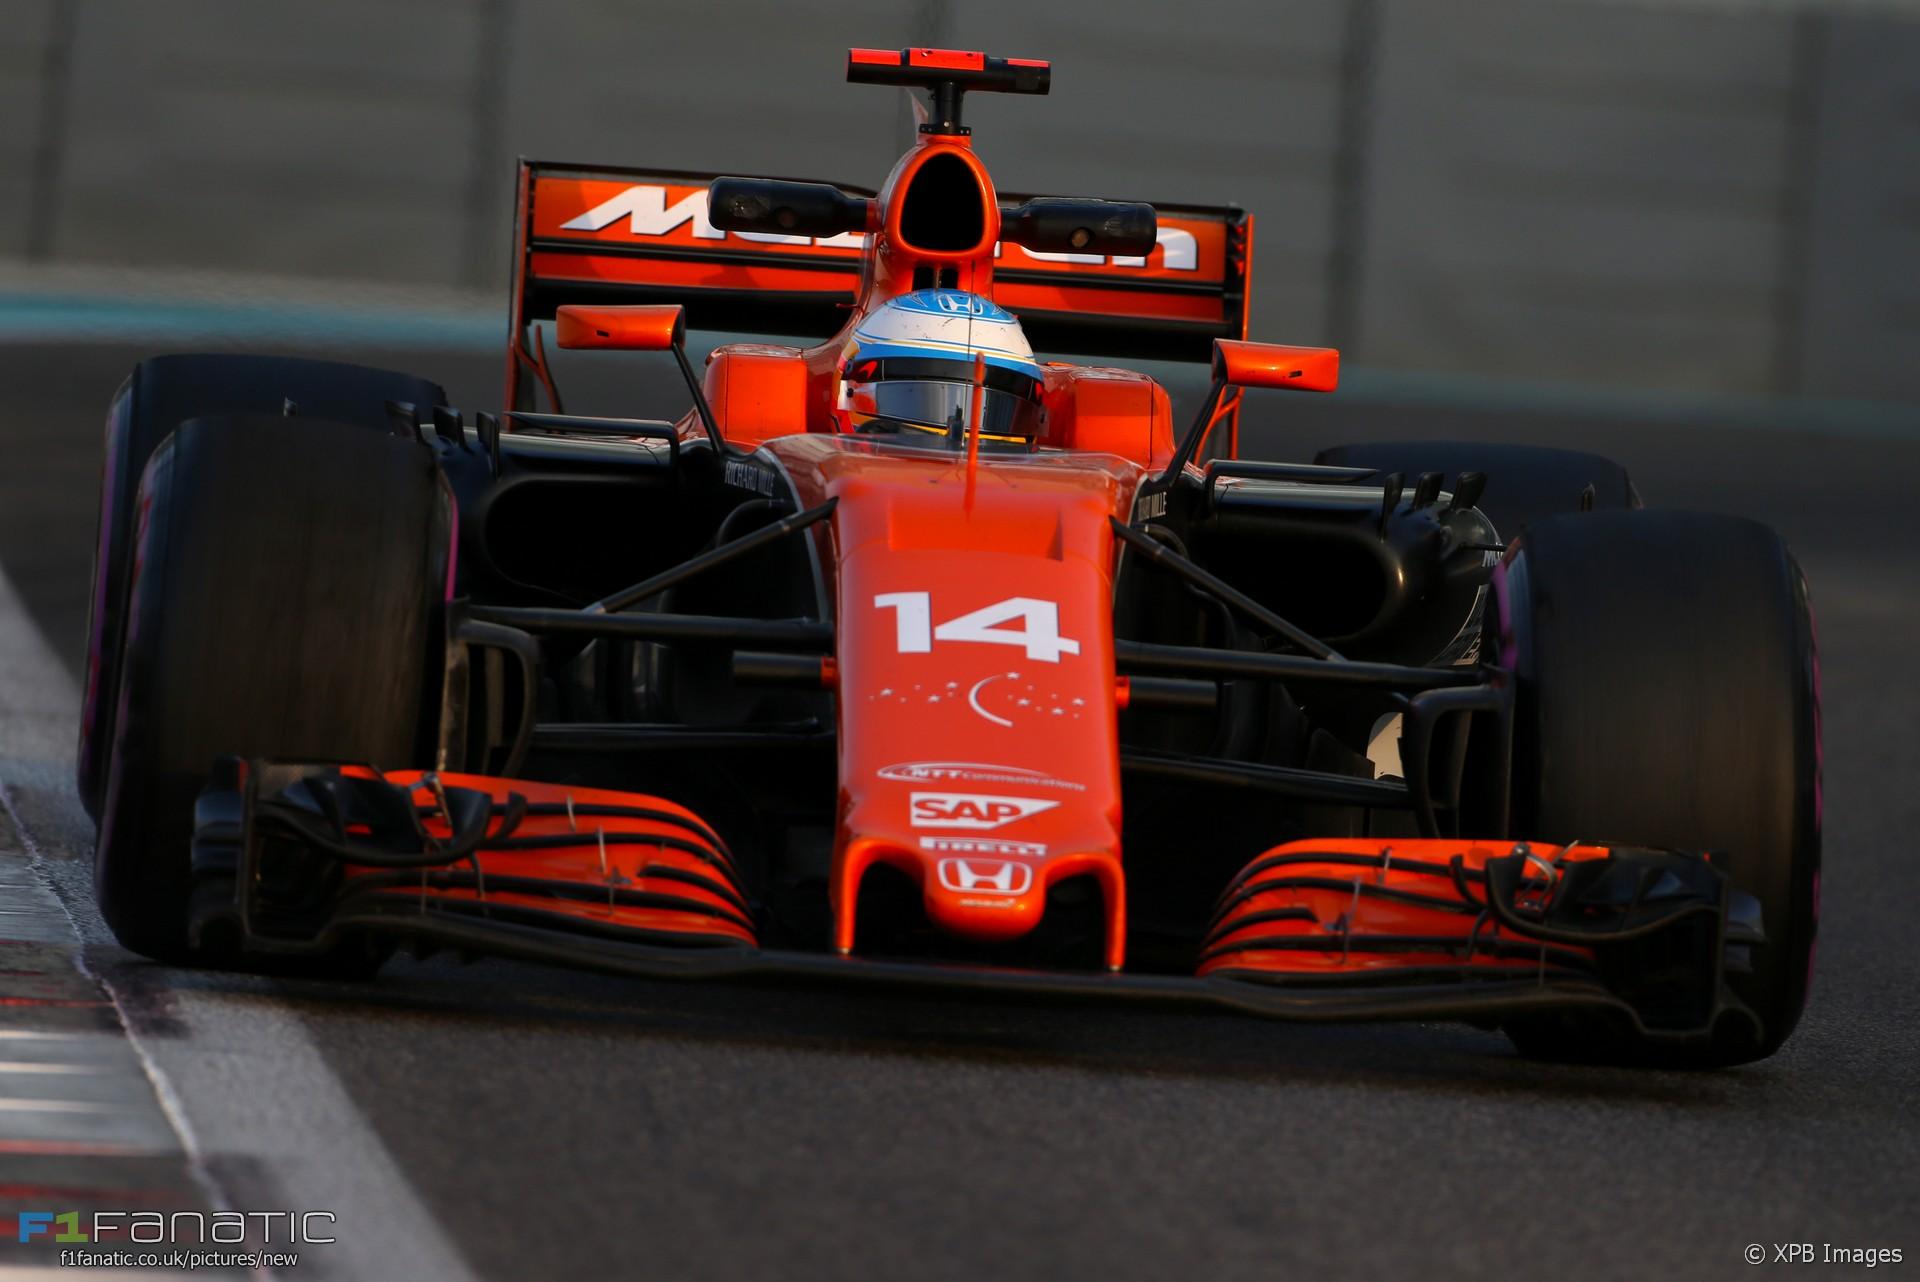 Fernando Alonso Mclaren Yas Marina 2017 F1 Fanatic